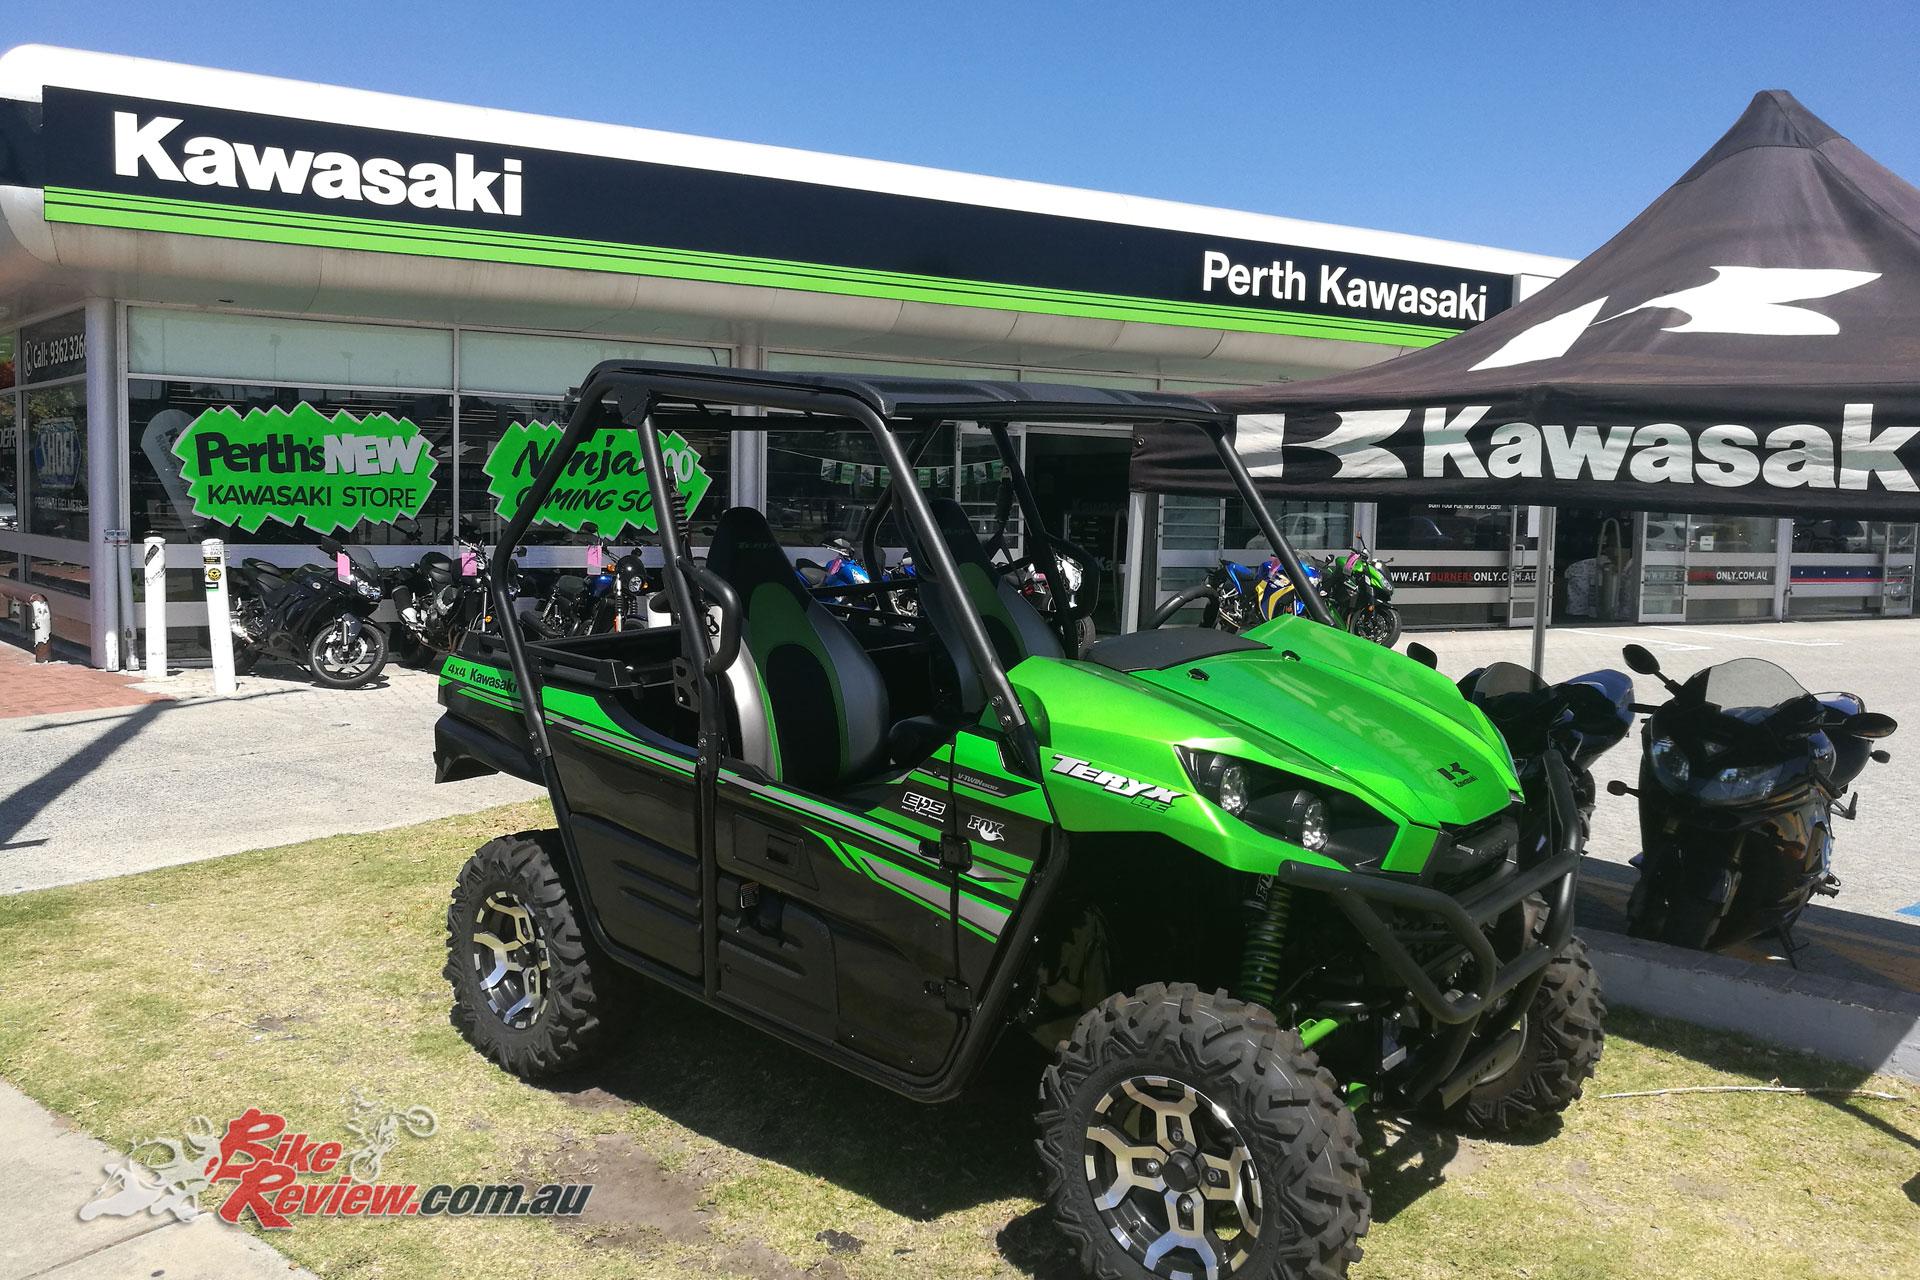 Perth Kawasaki - New Western Australian Dealership - Bike Review